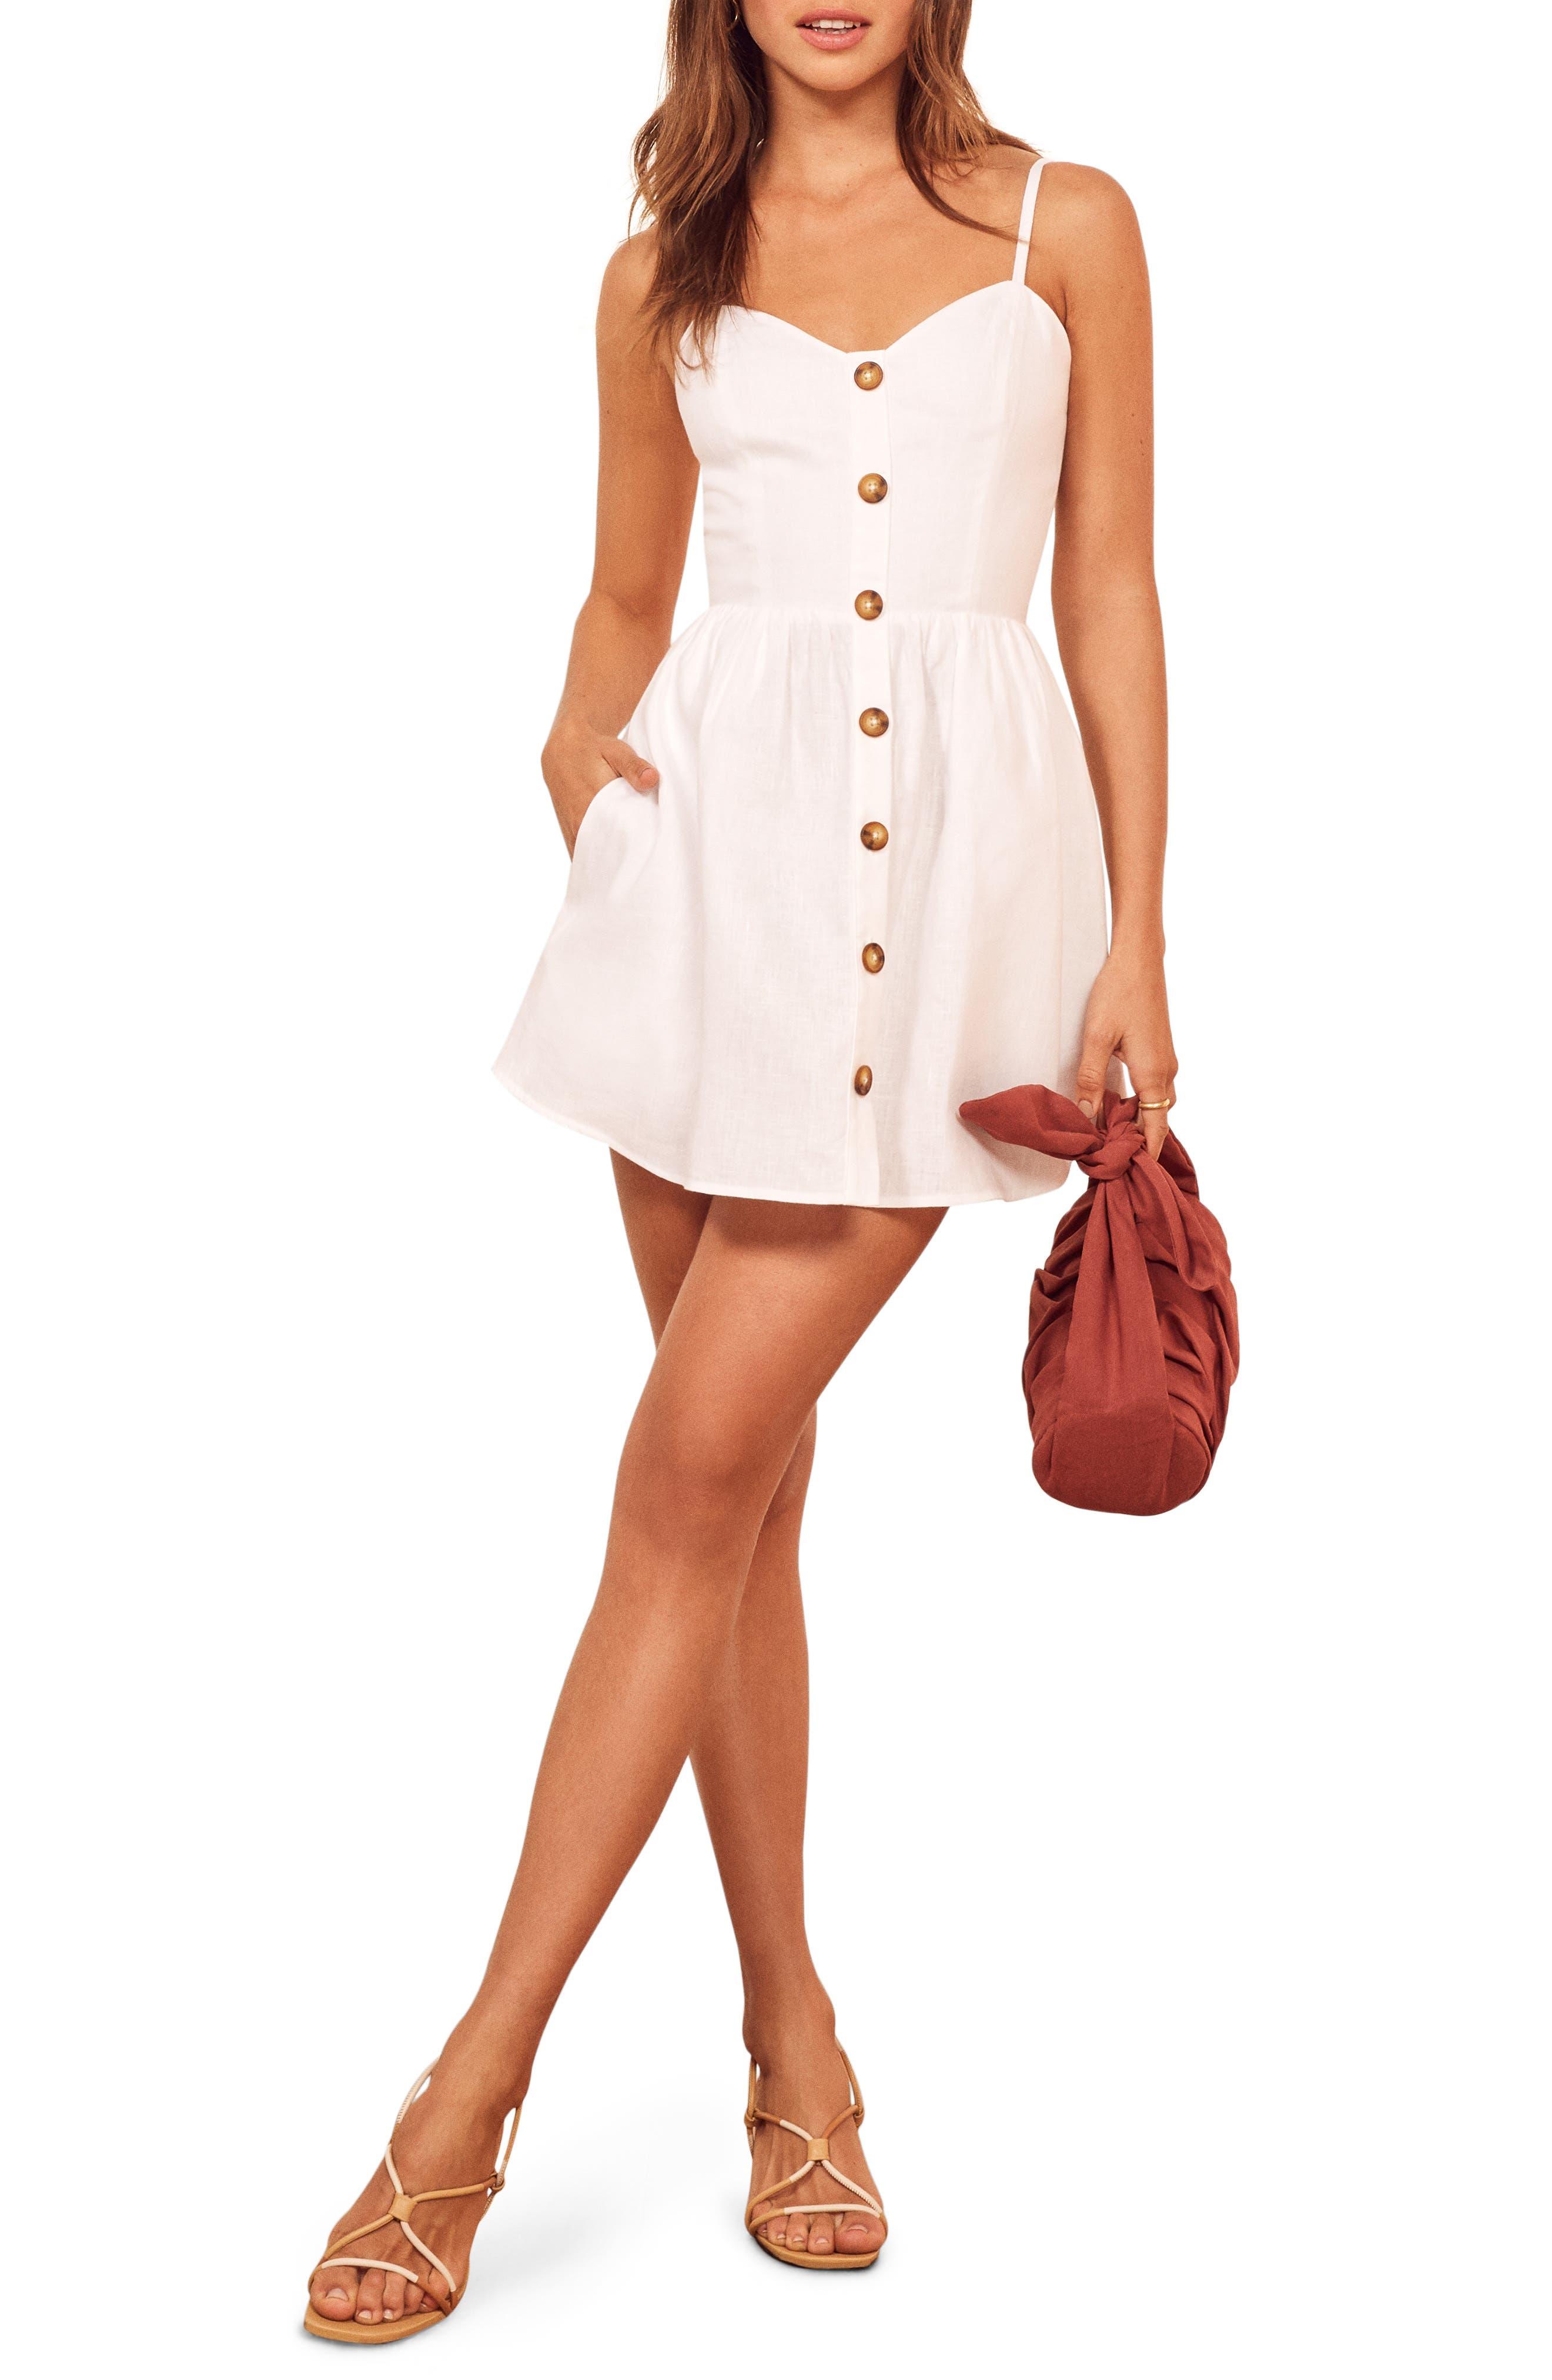 Reformation Velma Sleeveless Minidress, White